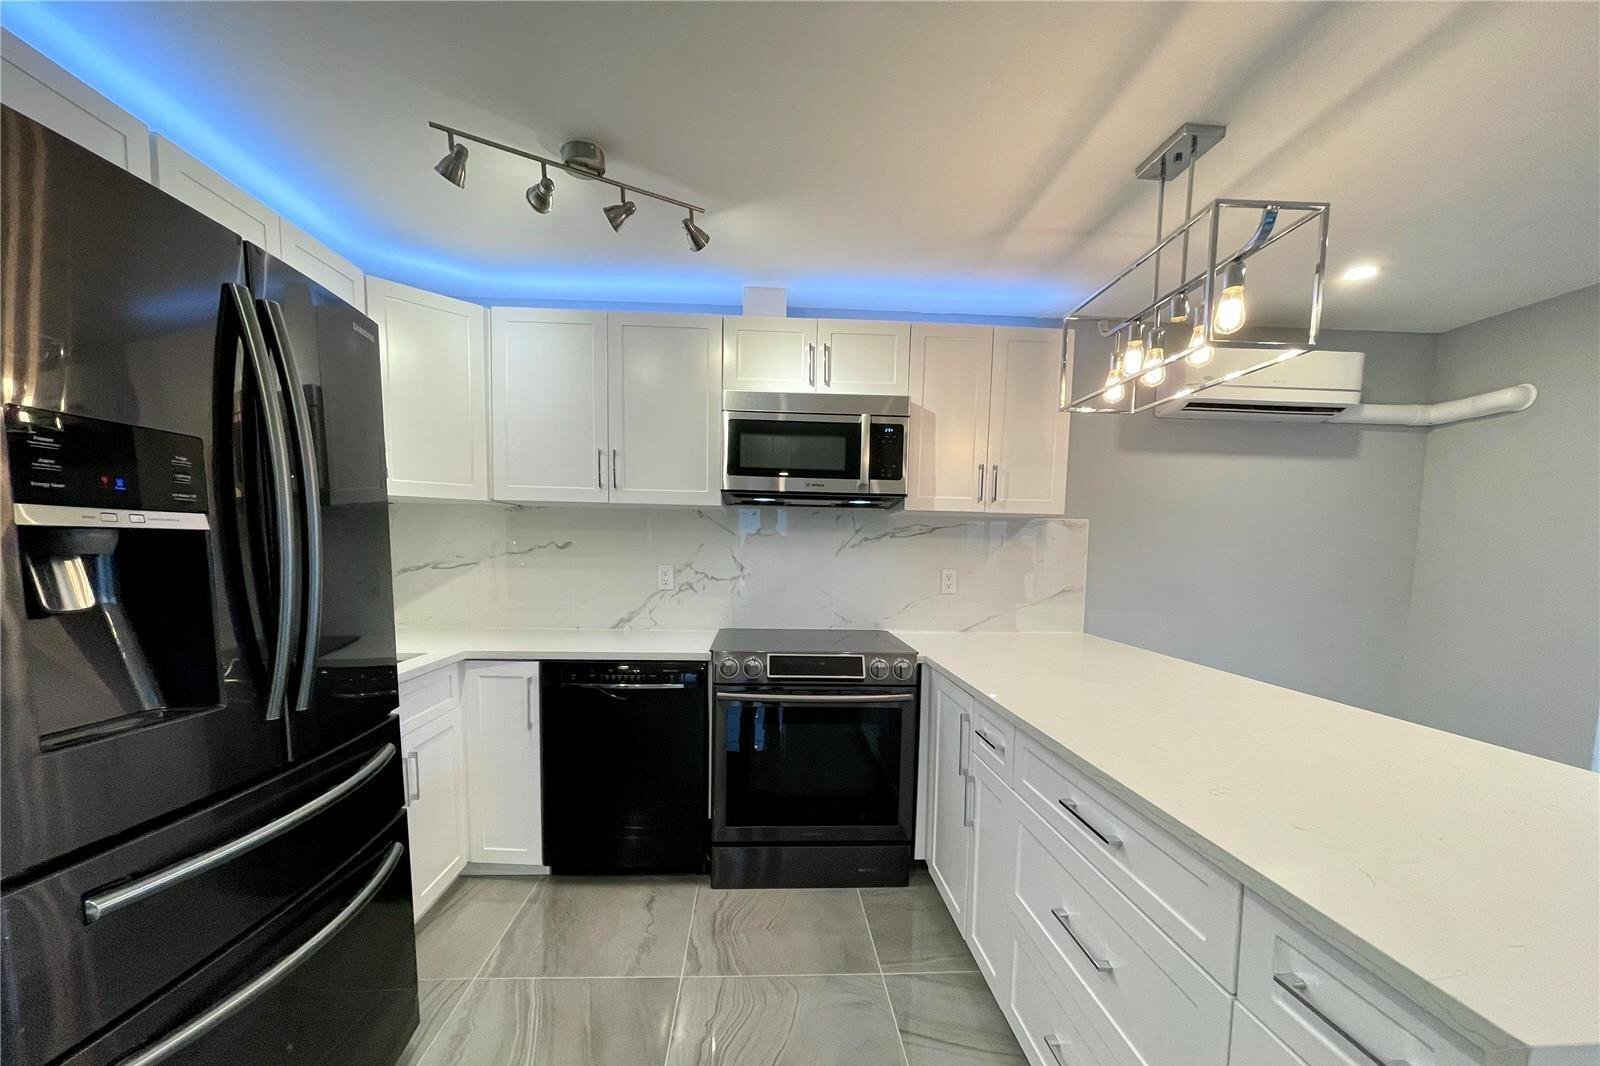 Condo for sale at 737 Leon Ave Unit 1204 Kelowna British Columbia - MLS: 10217777